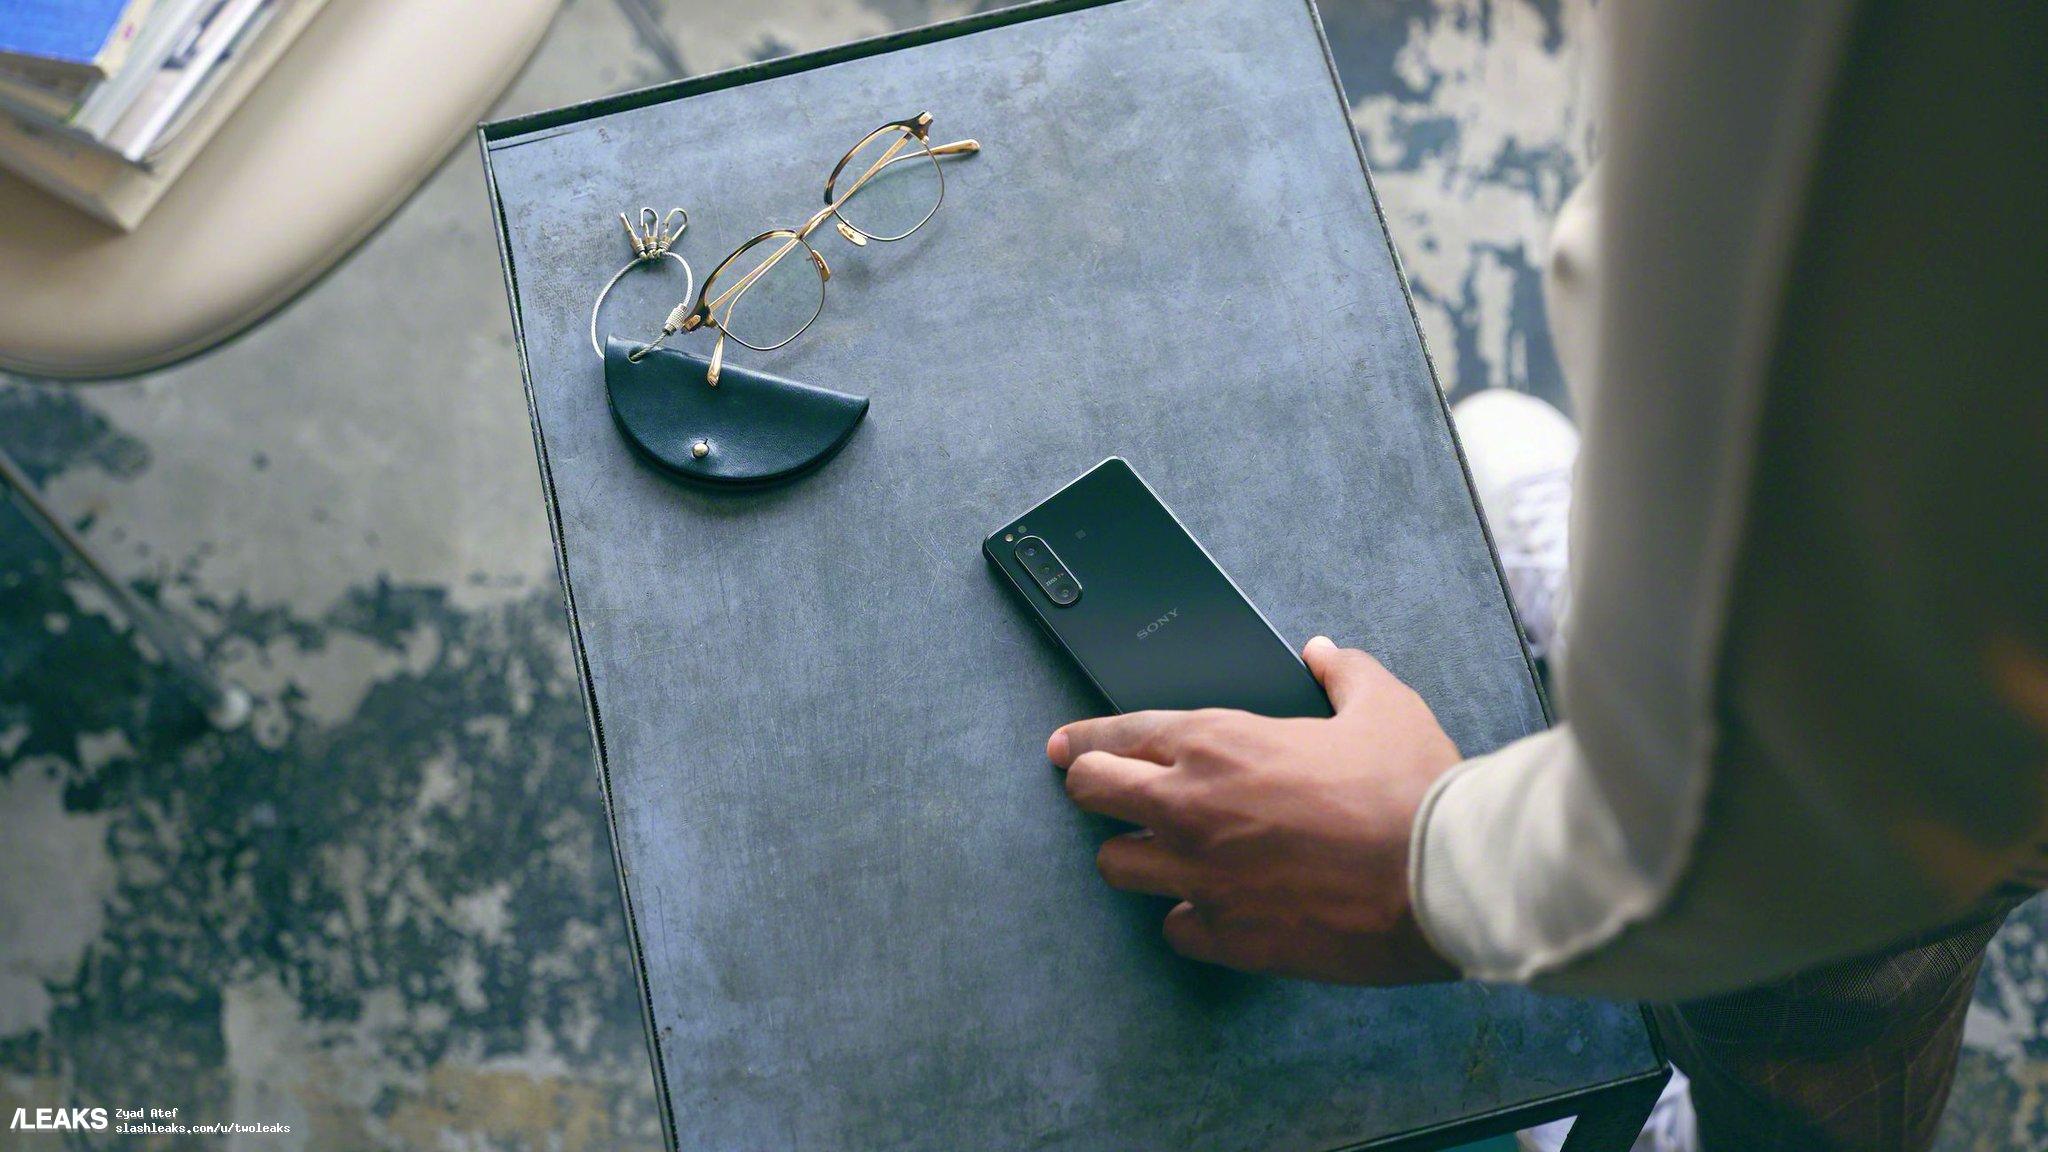 img Sony Xperia 5 II promo material leaked